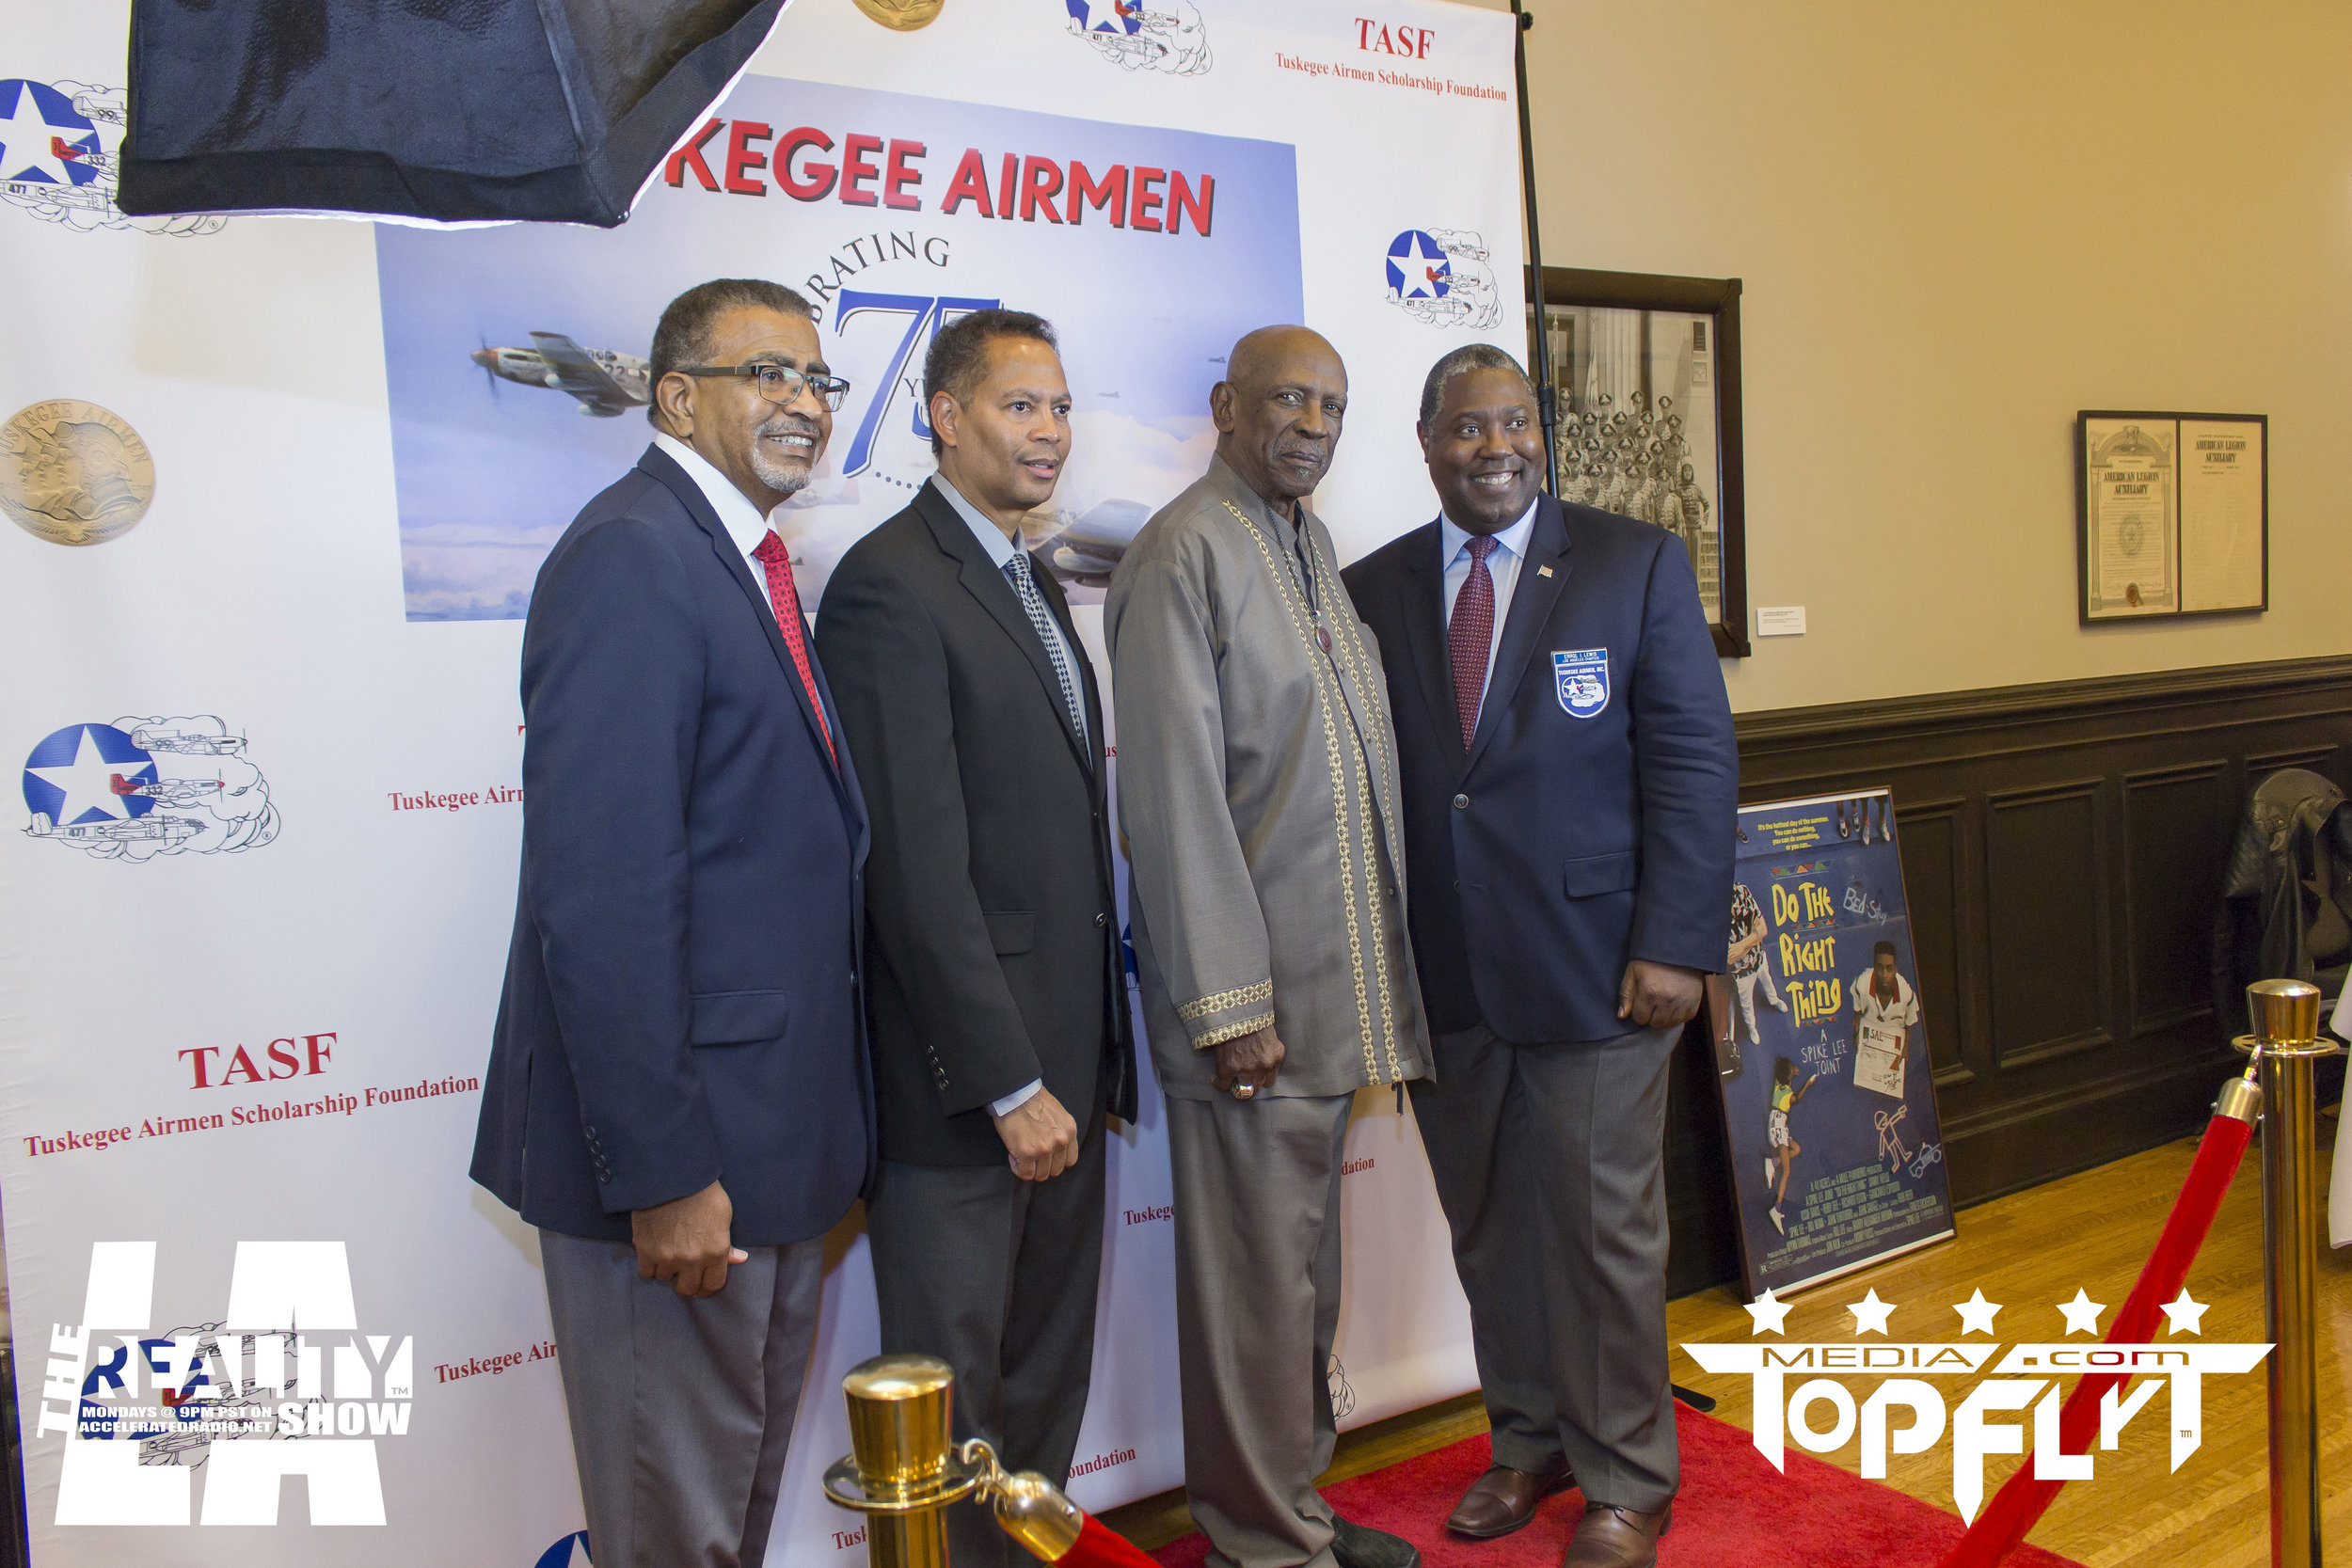 The Reality Show LA - Tuskegee Airmen 75th Anniversary VIP Reception_71.jpg